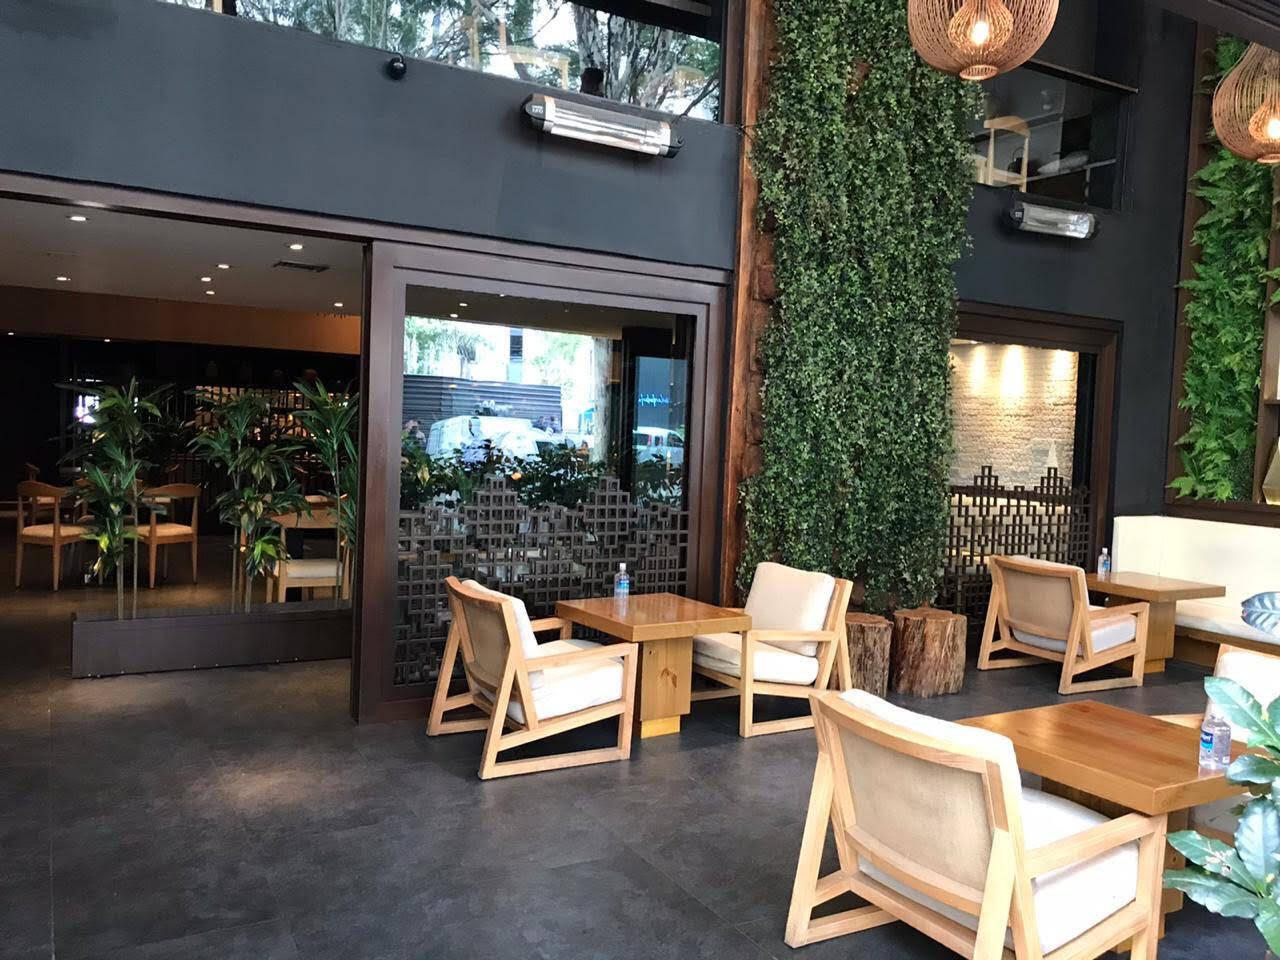 Como adaptar bares, restaurantes e salões de beleza durante a pandemia